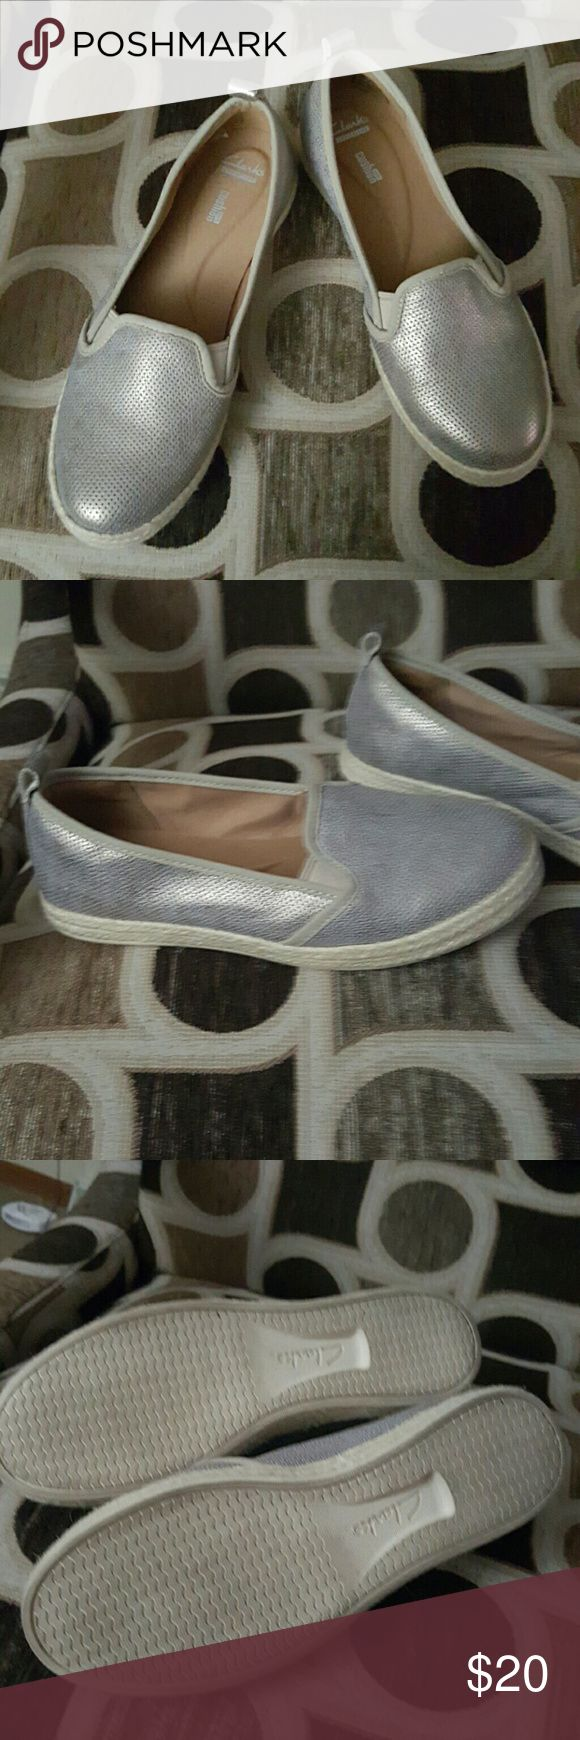 Clarks Metallic Espadrilles Womens metallic espadrilles, criss between a gold and silver, sz. 9 Wide Clarks Shoes Espadrilles